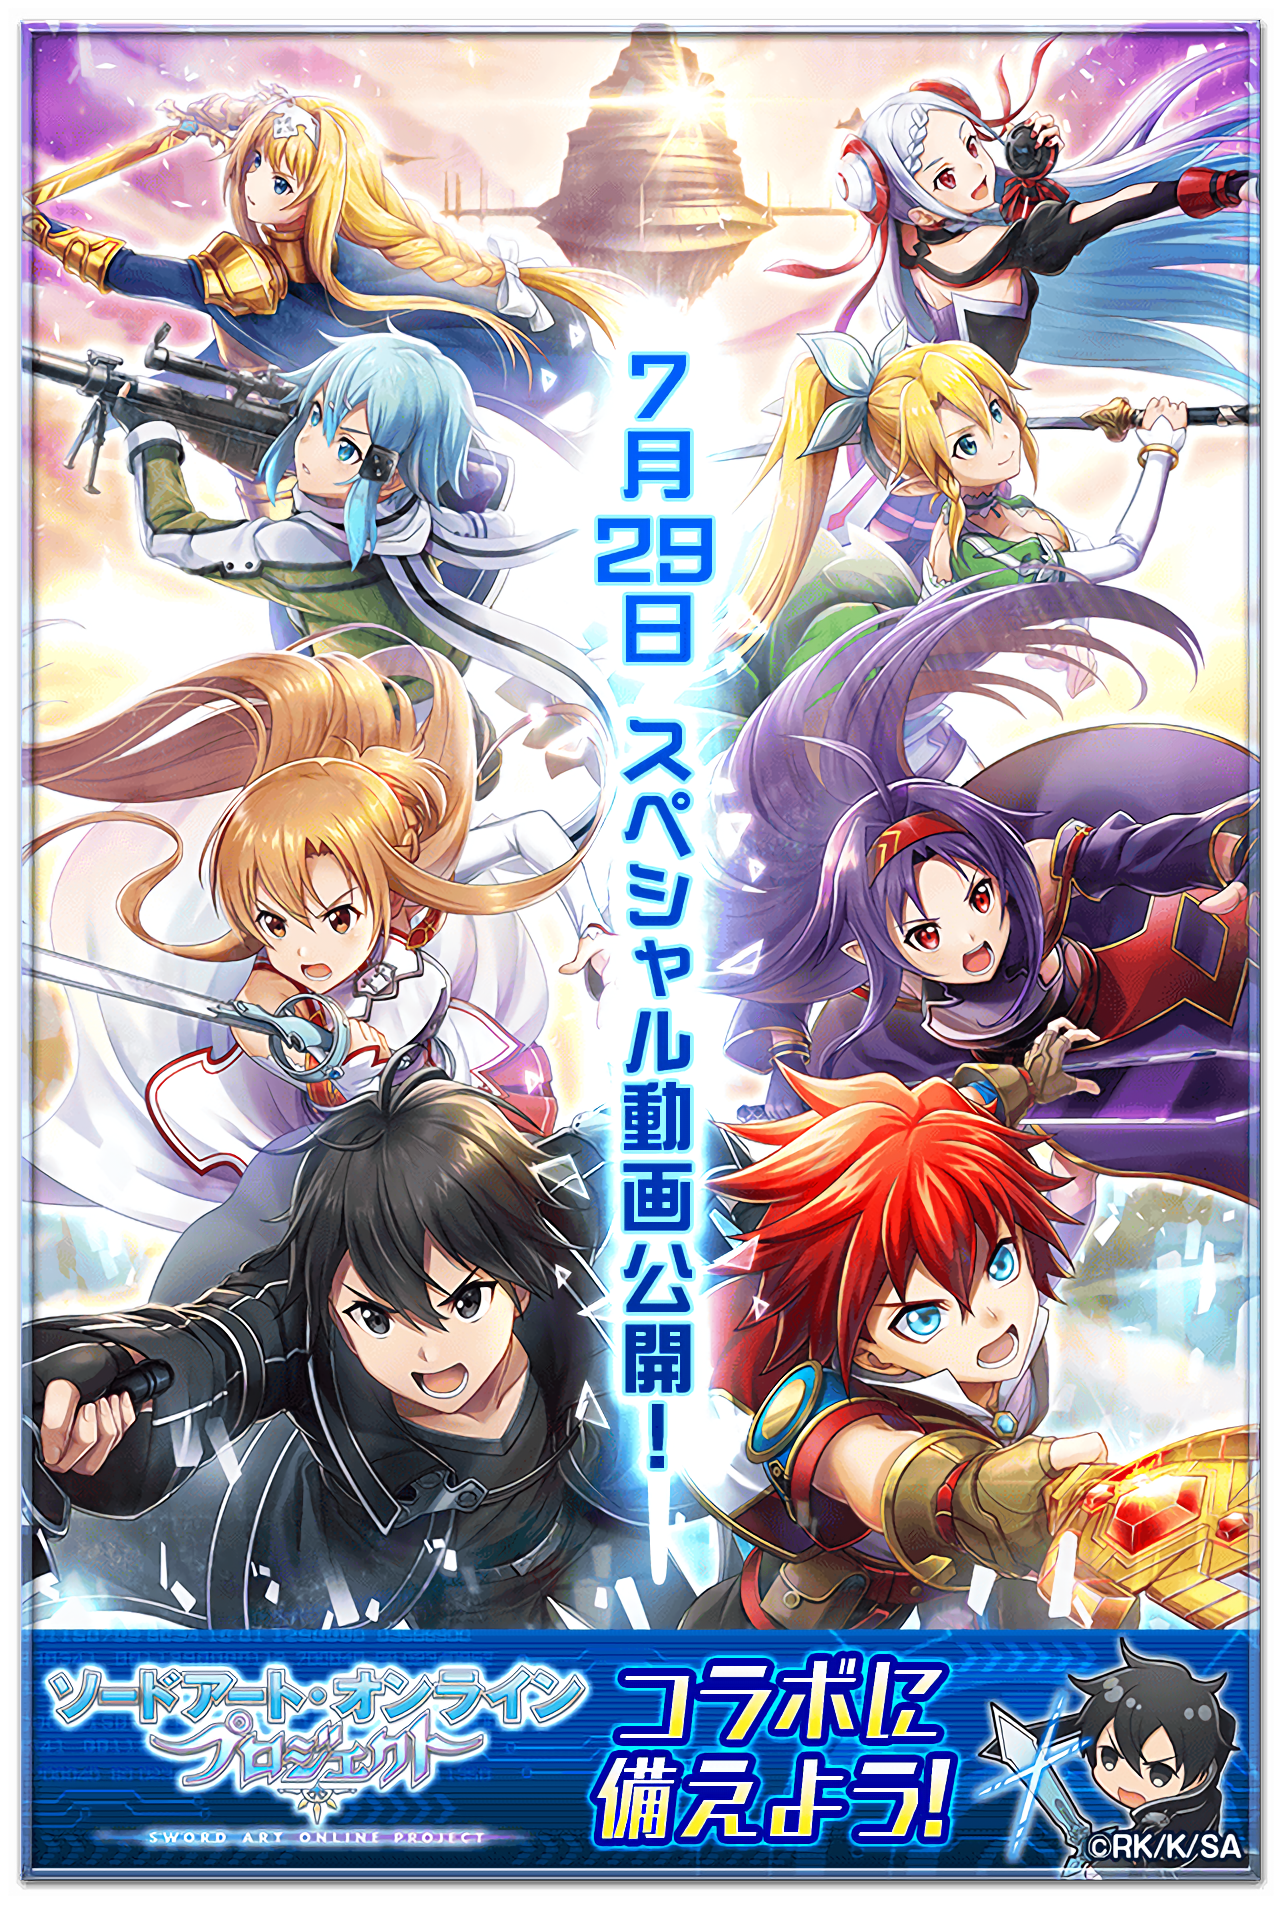 MC Shironeko Project Sword Art Online (SAO) Collaboration